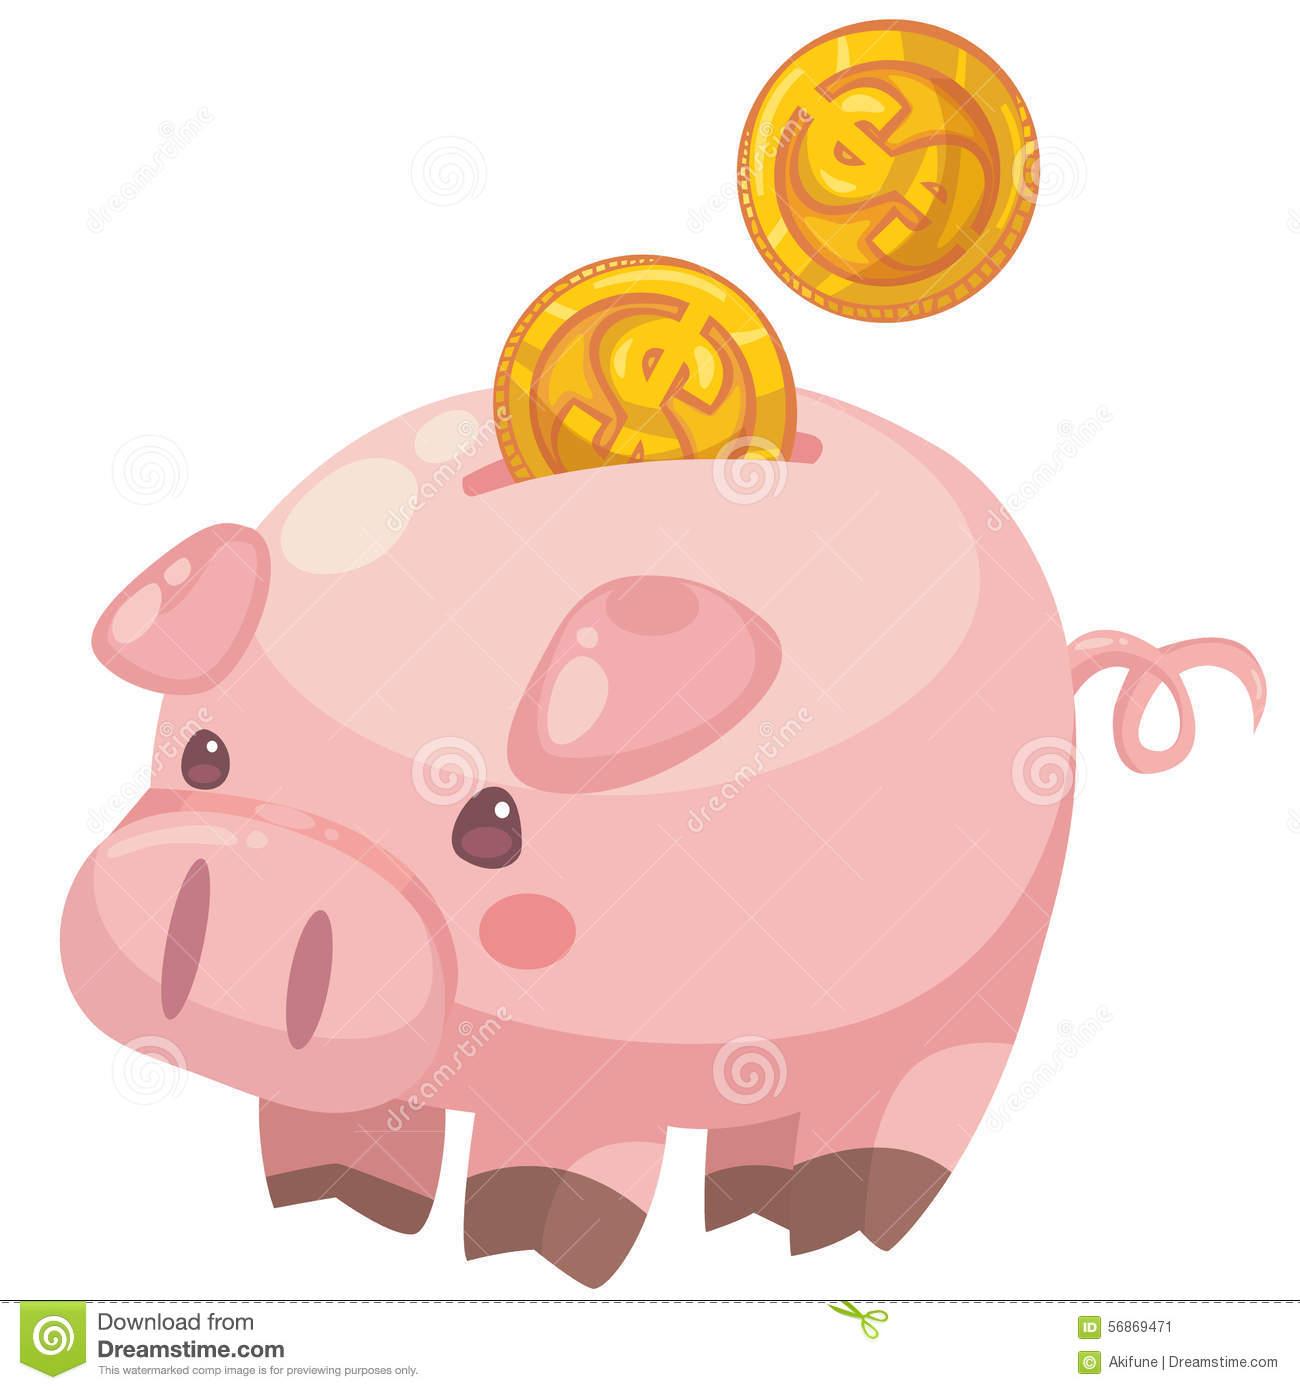 Cartoon with coins stock. Clipart cute piggy bank